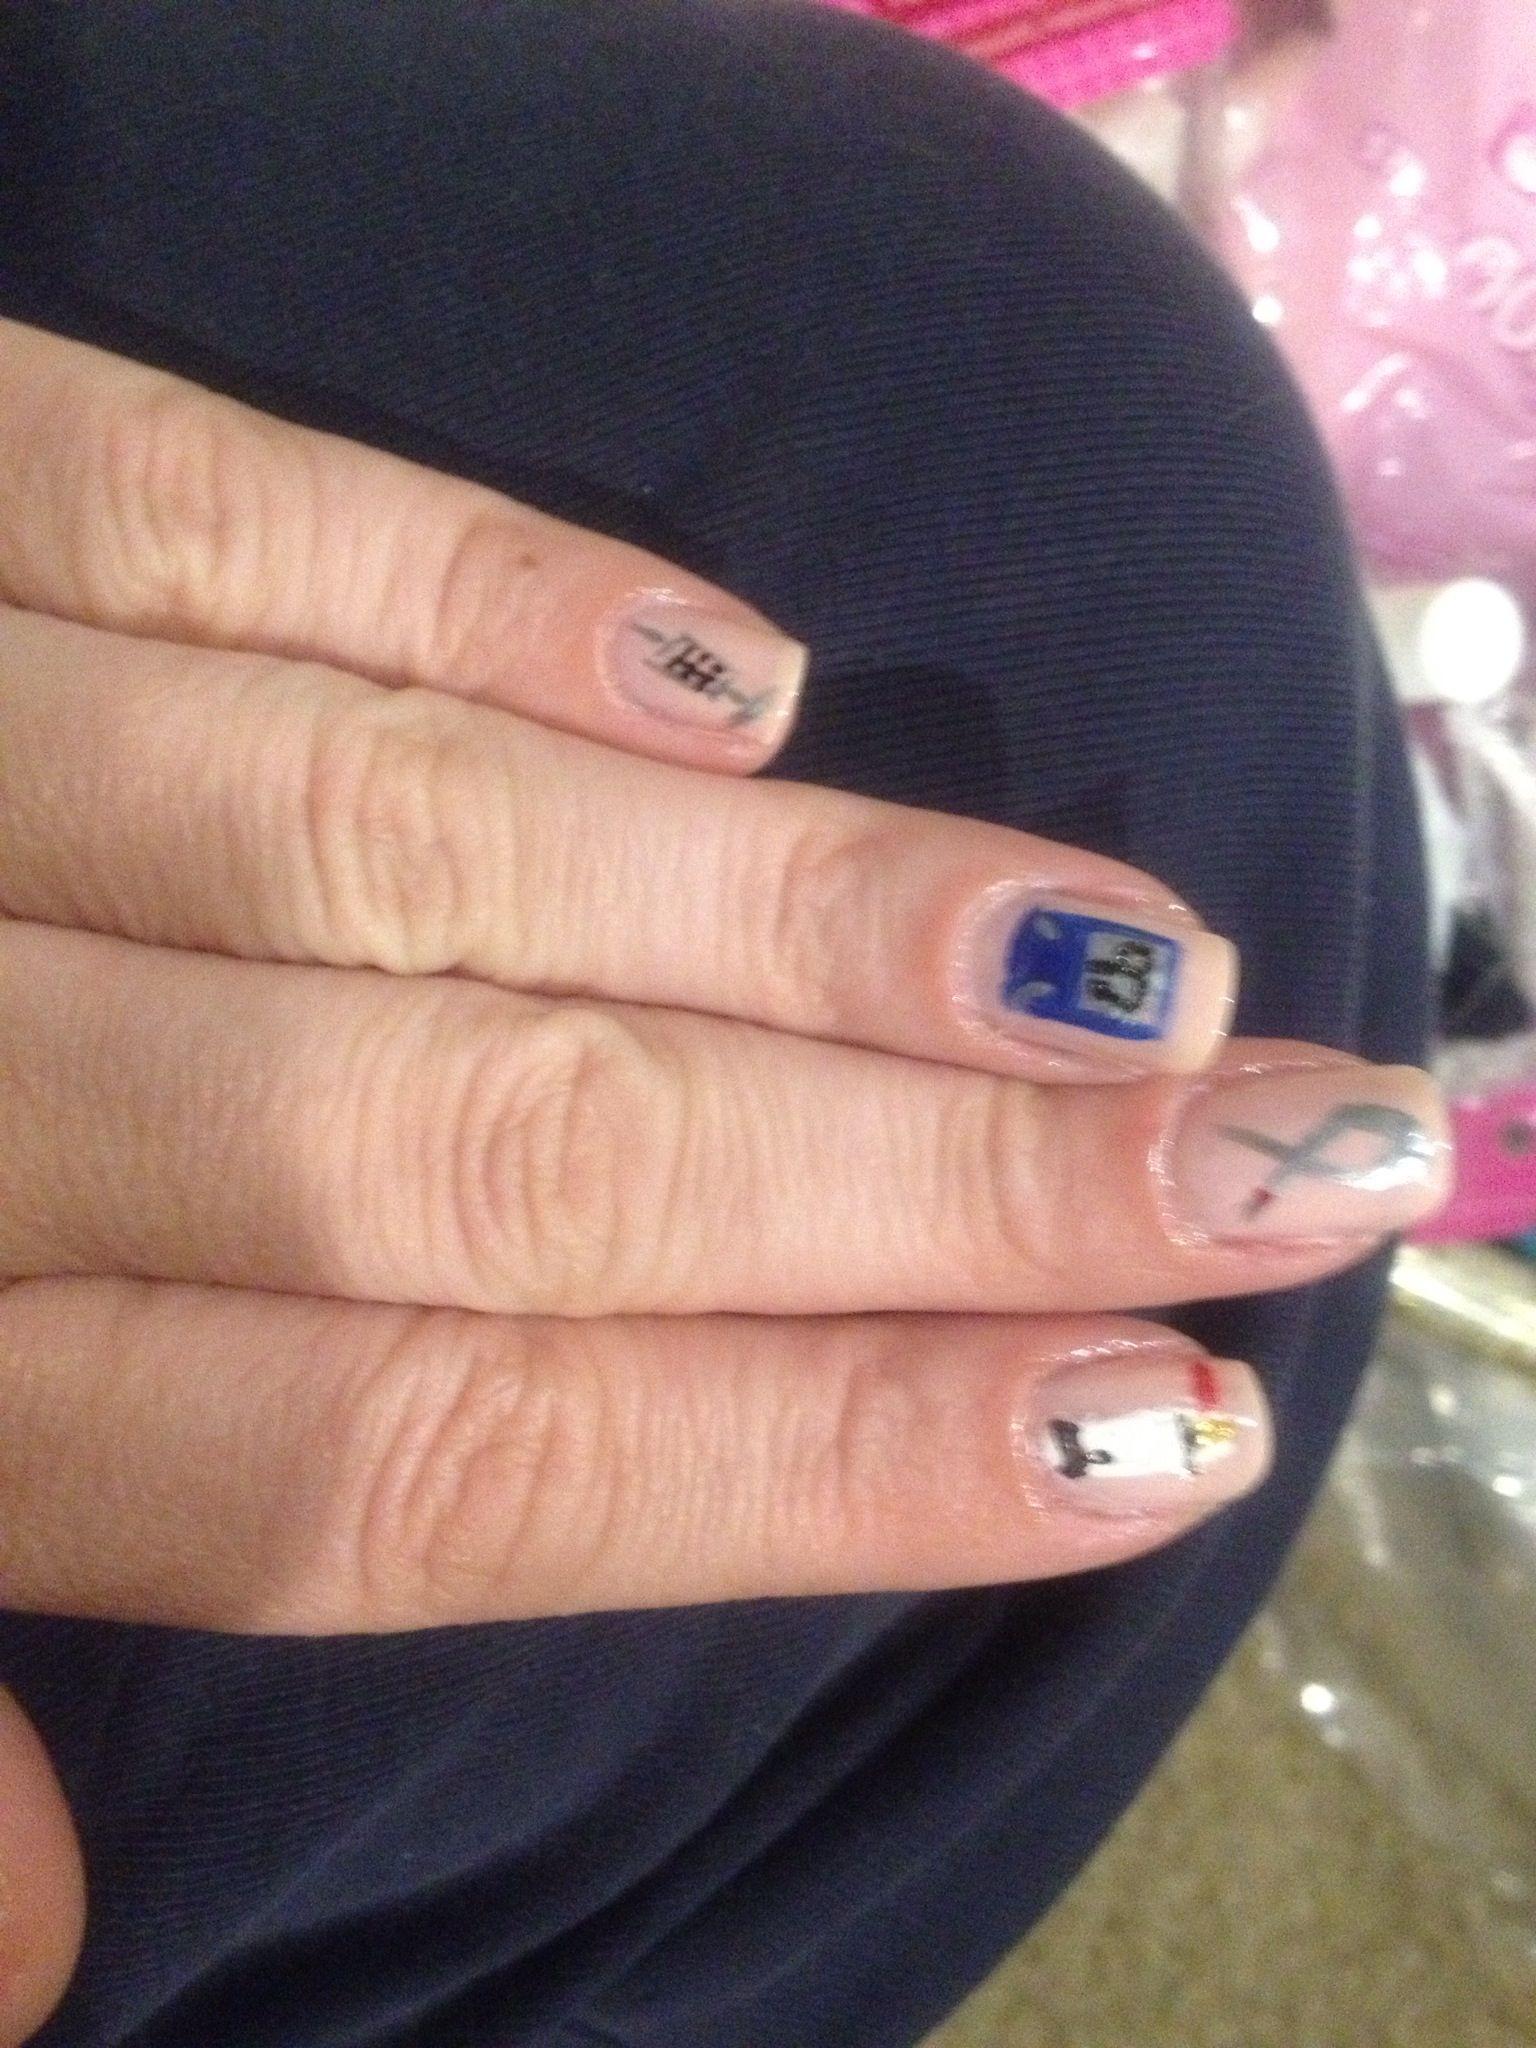 Diabetes Nail Art Part 1 | Nails By Jen | Pinterest | Diabetes